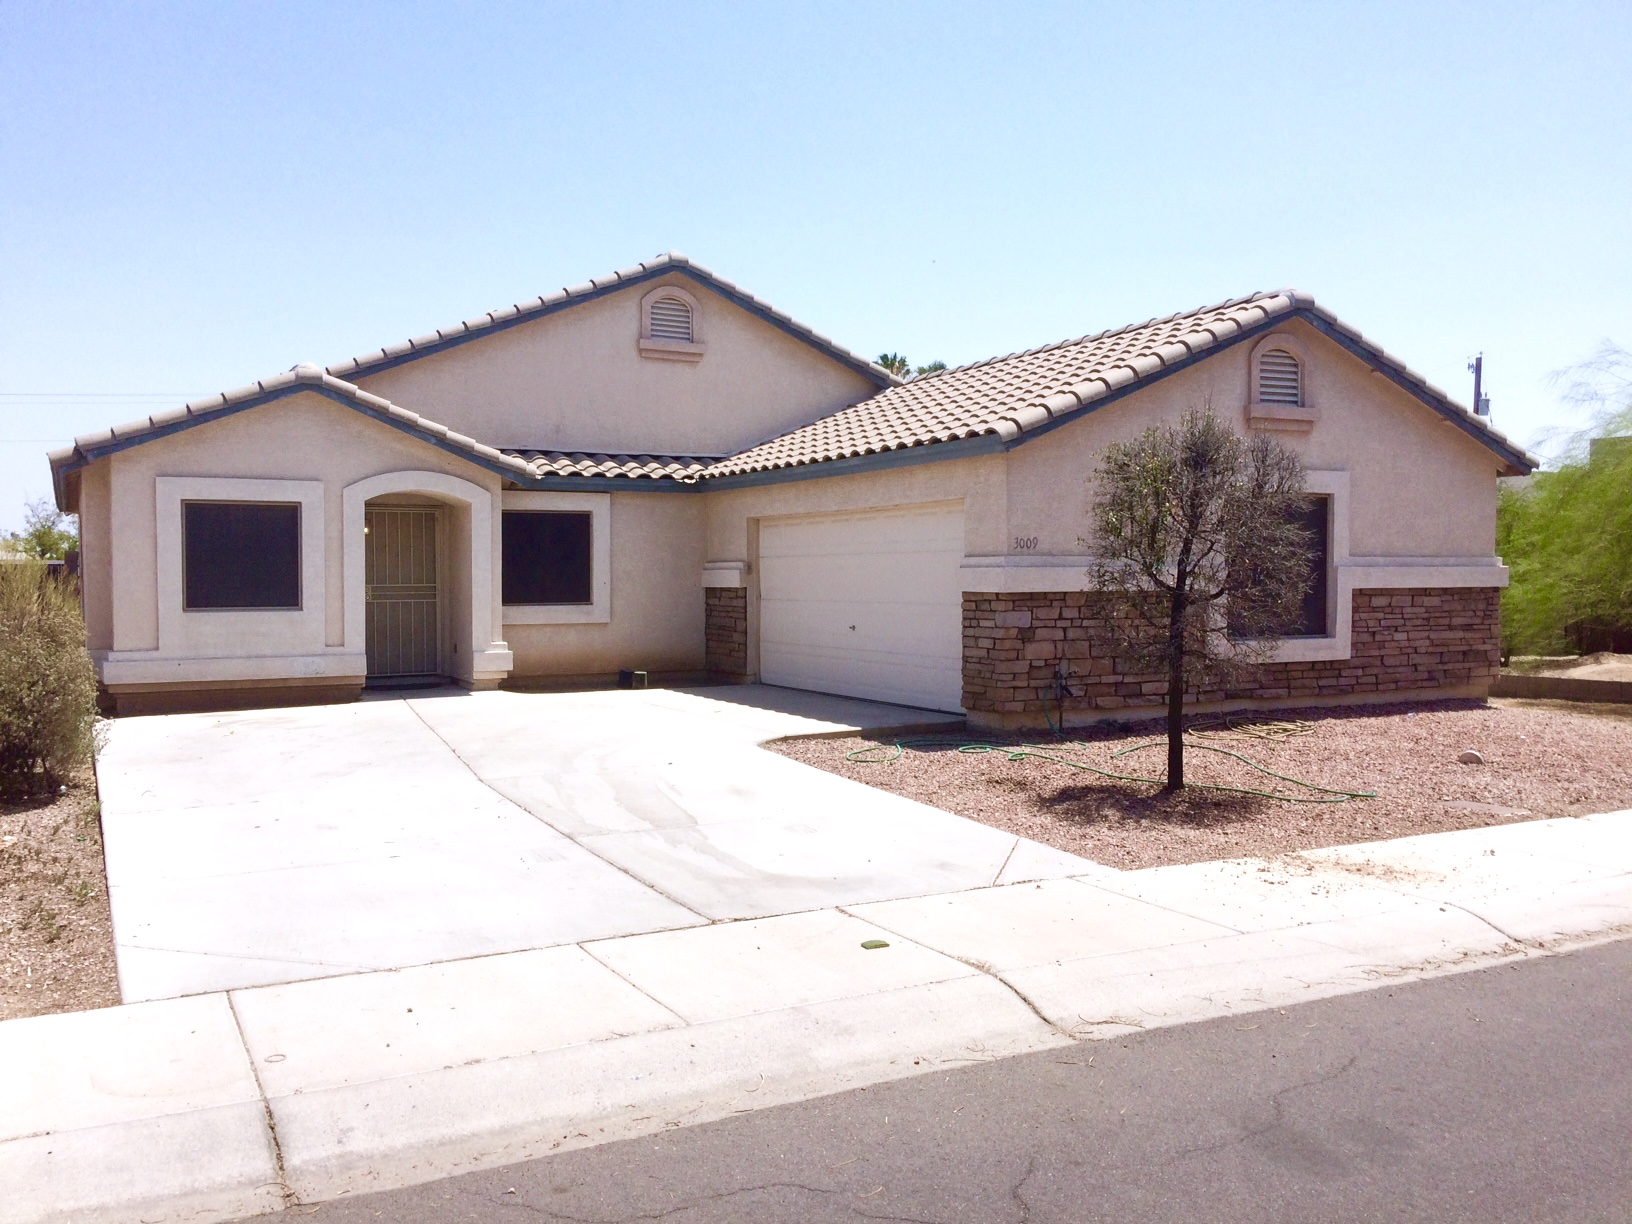 3009 N 83rd Dr, Phoenix, AZ 85037